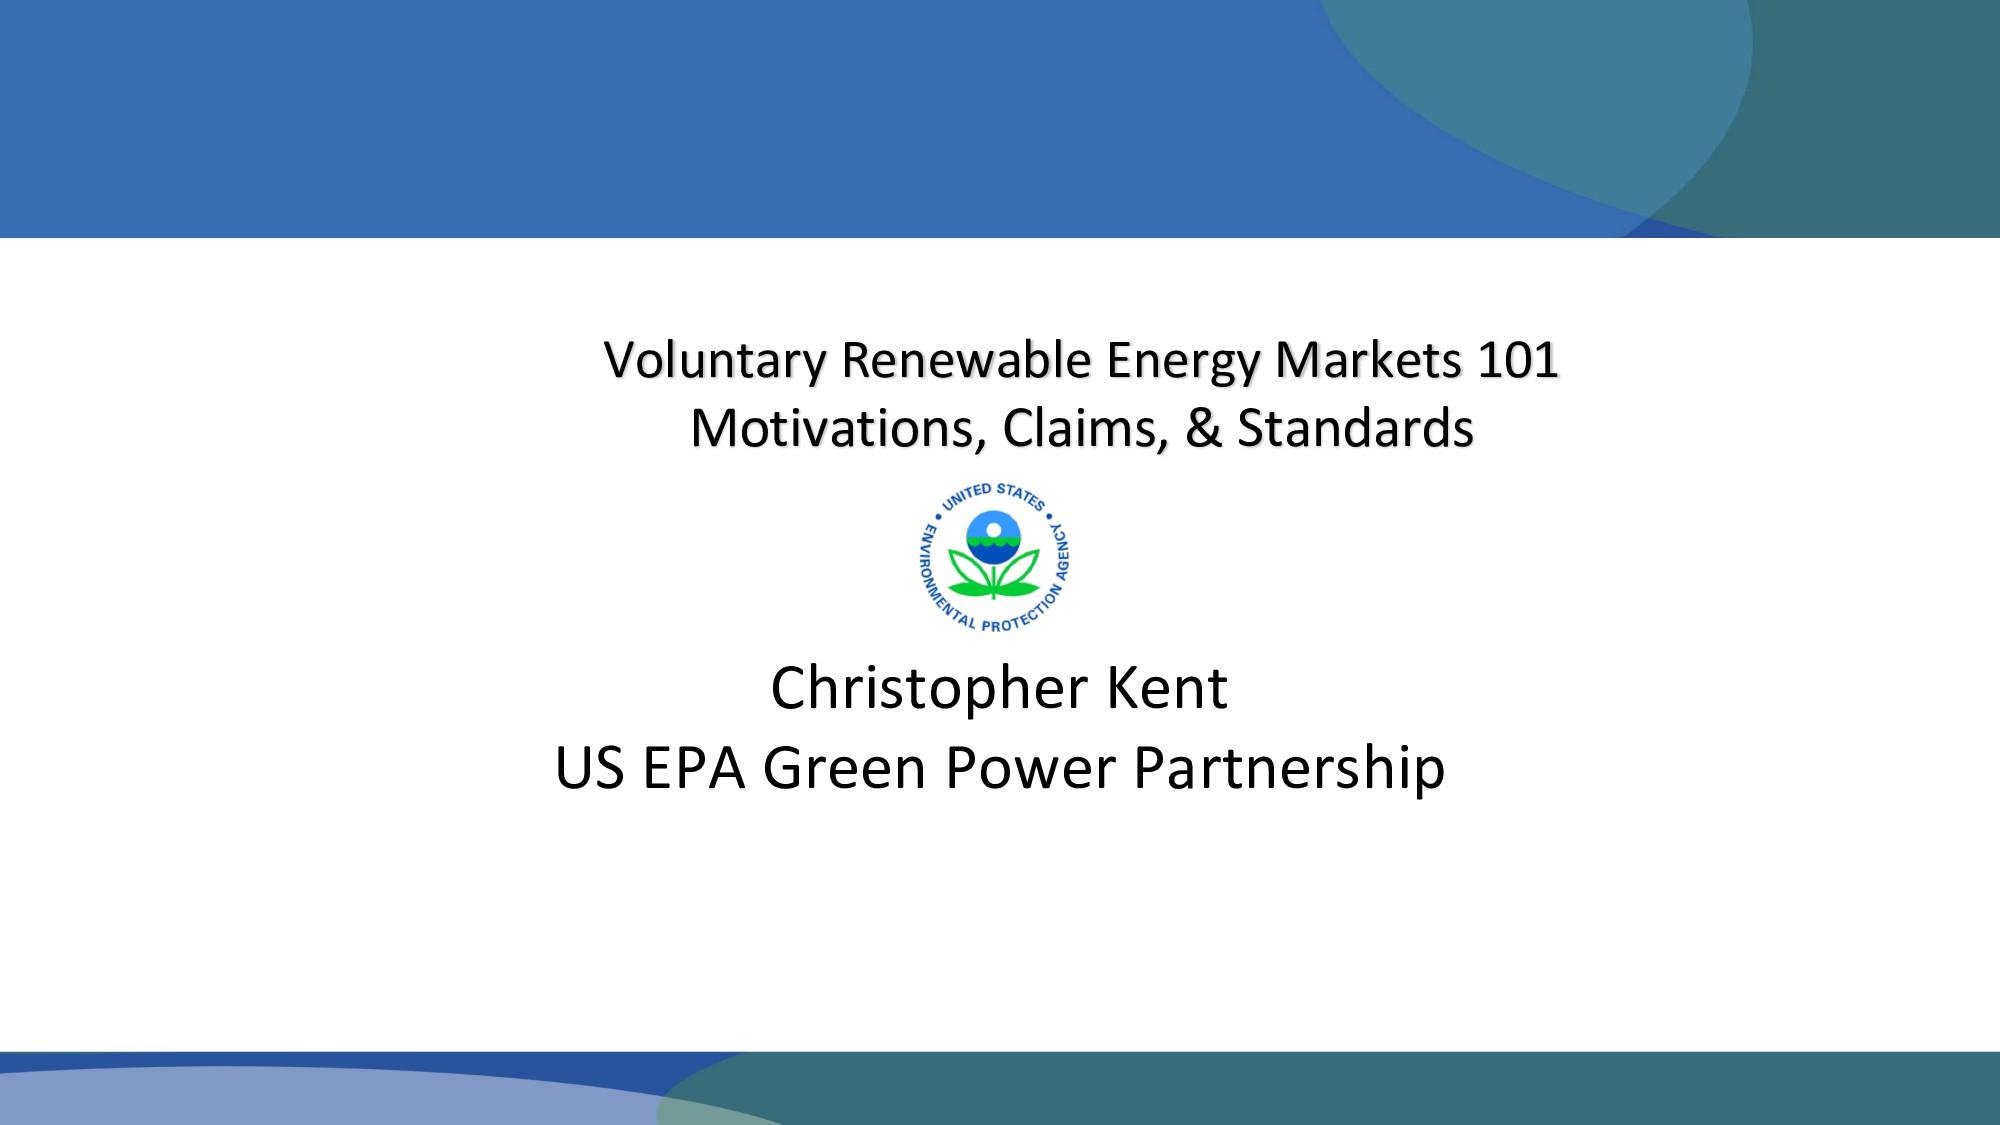 Voluntary Renewable Energy Markets 101 Motivati...